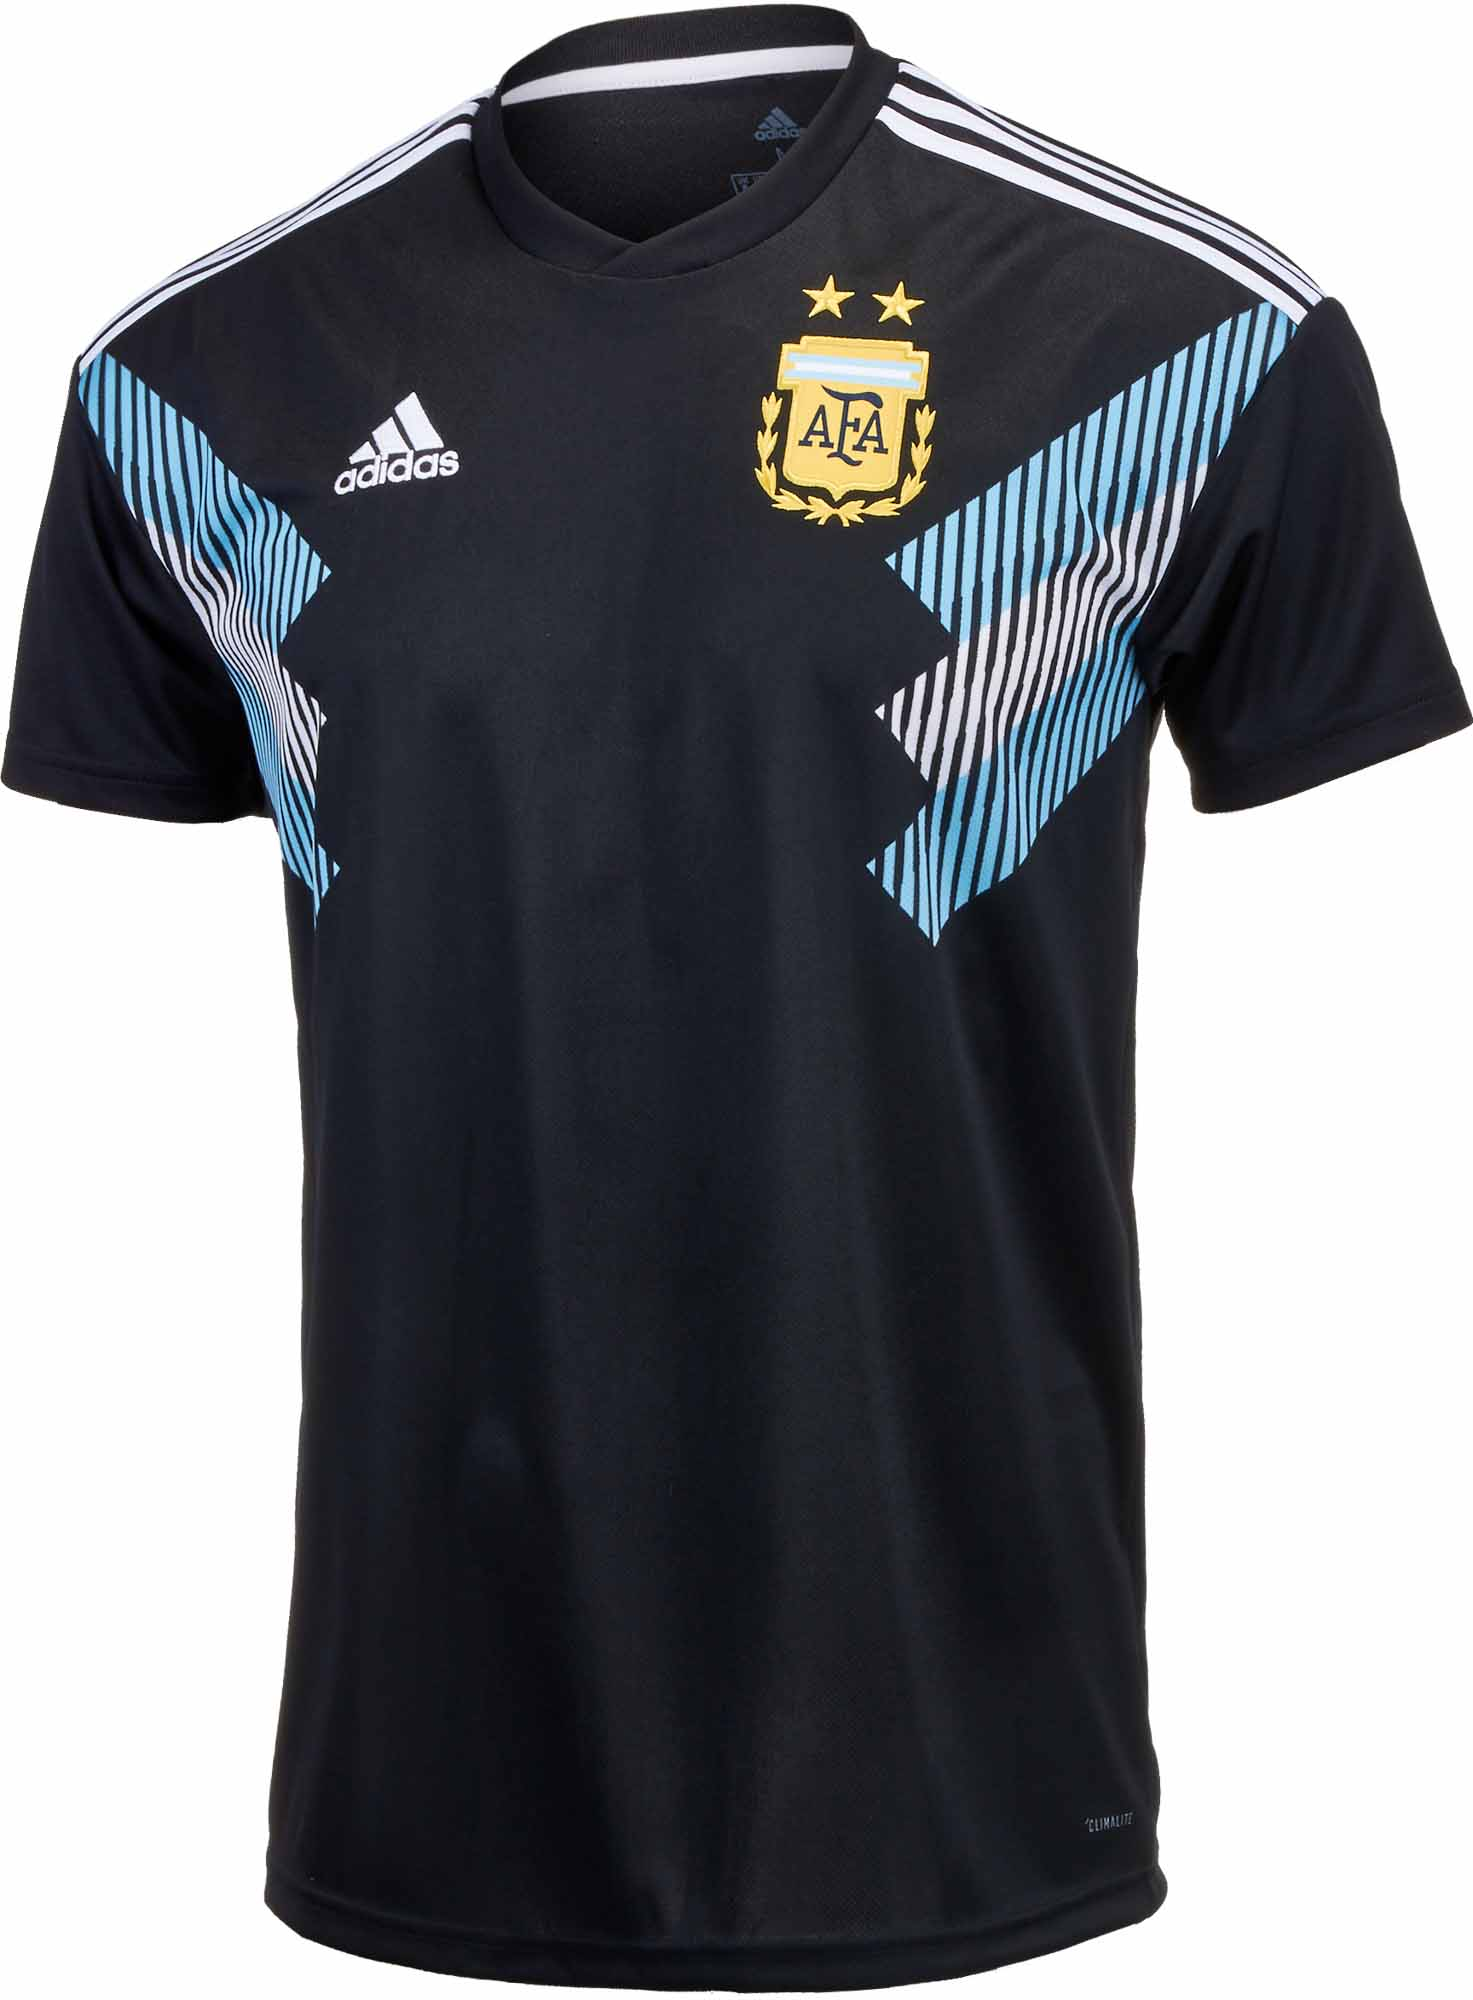 Adidas Argentina Away Jersey 2018 19 Soccerpro Com